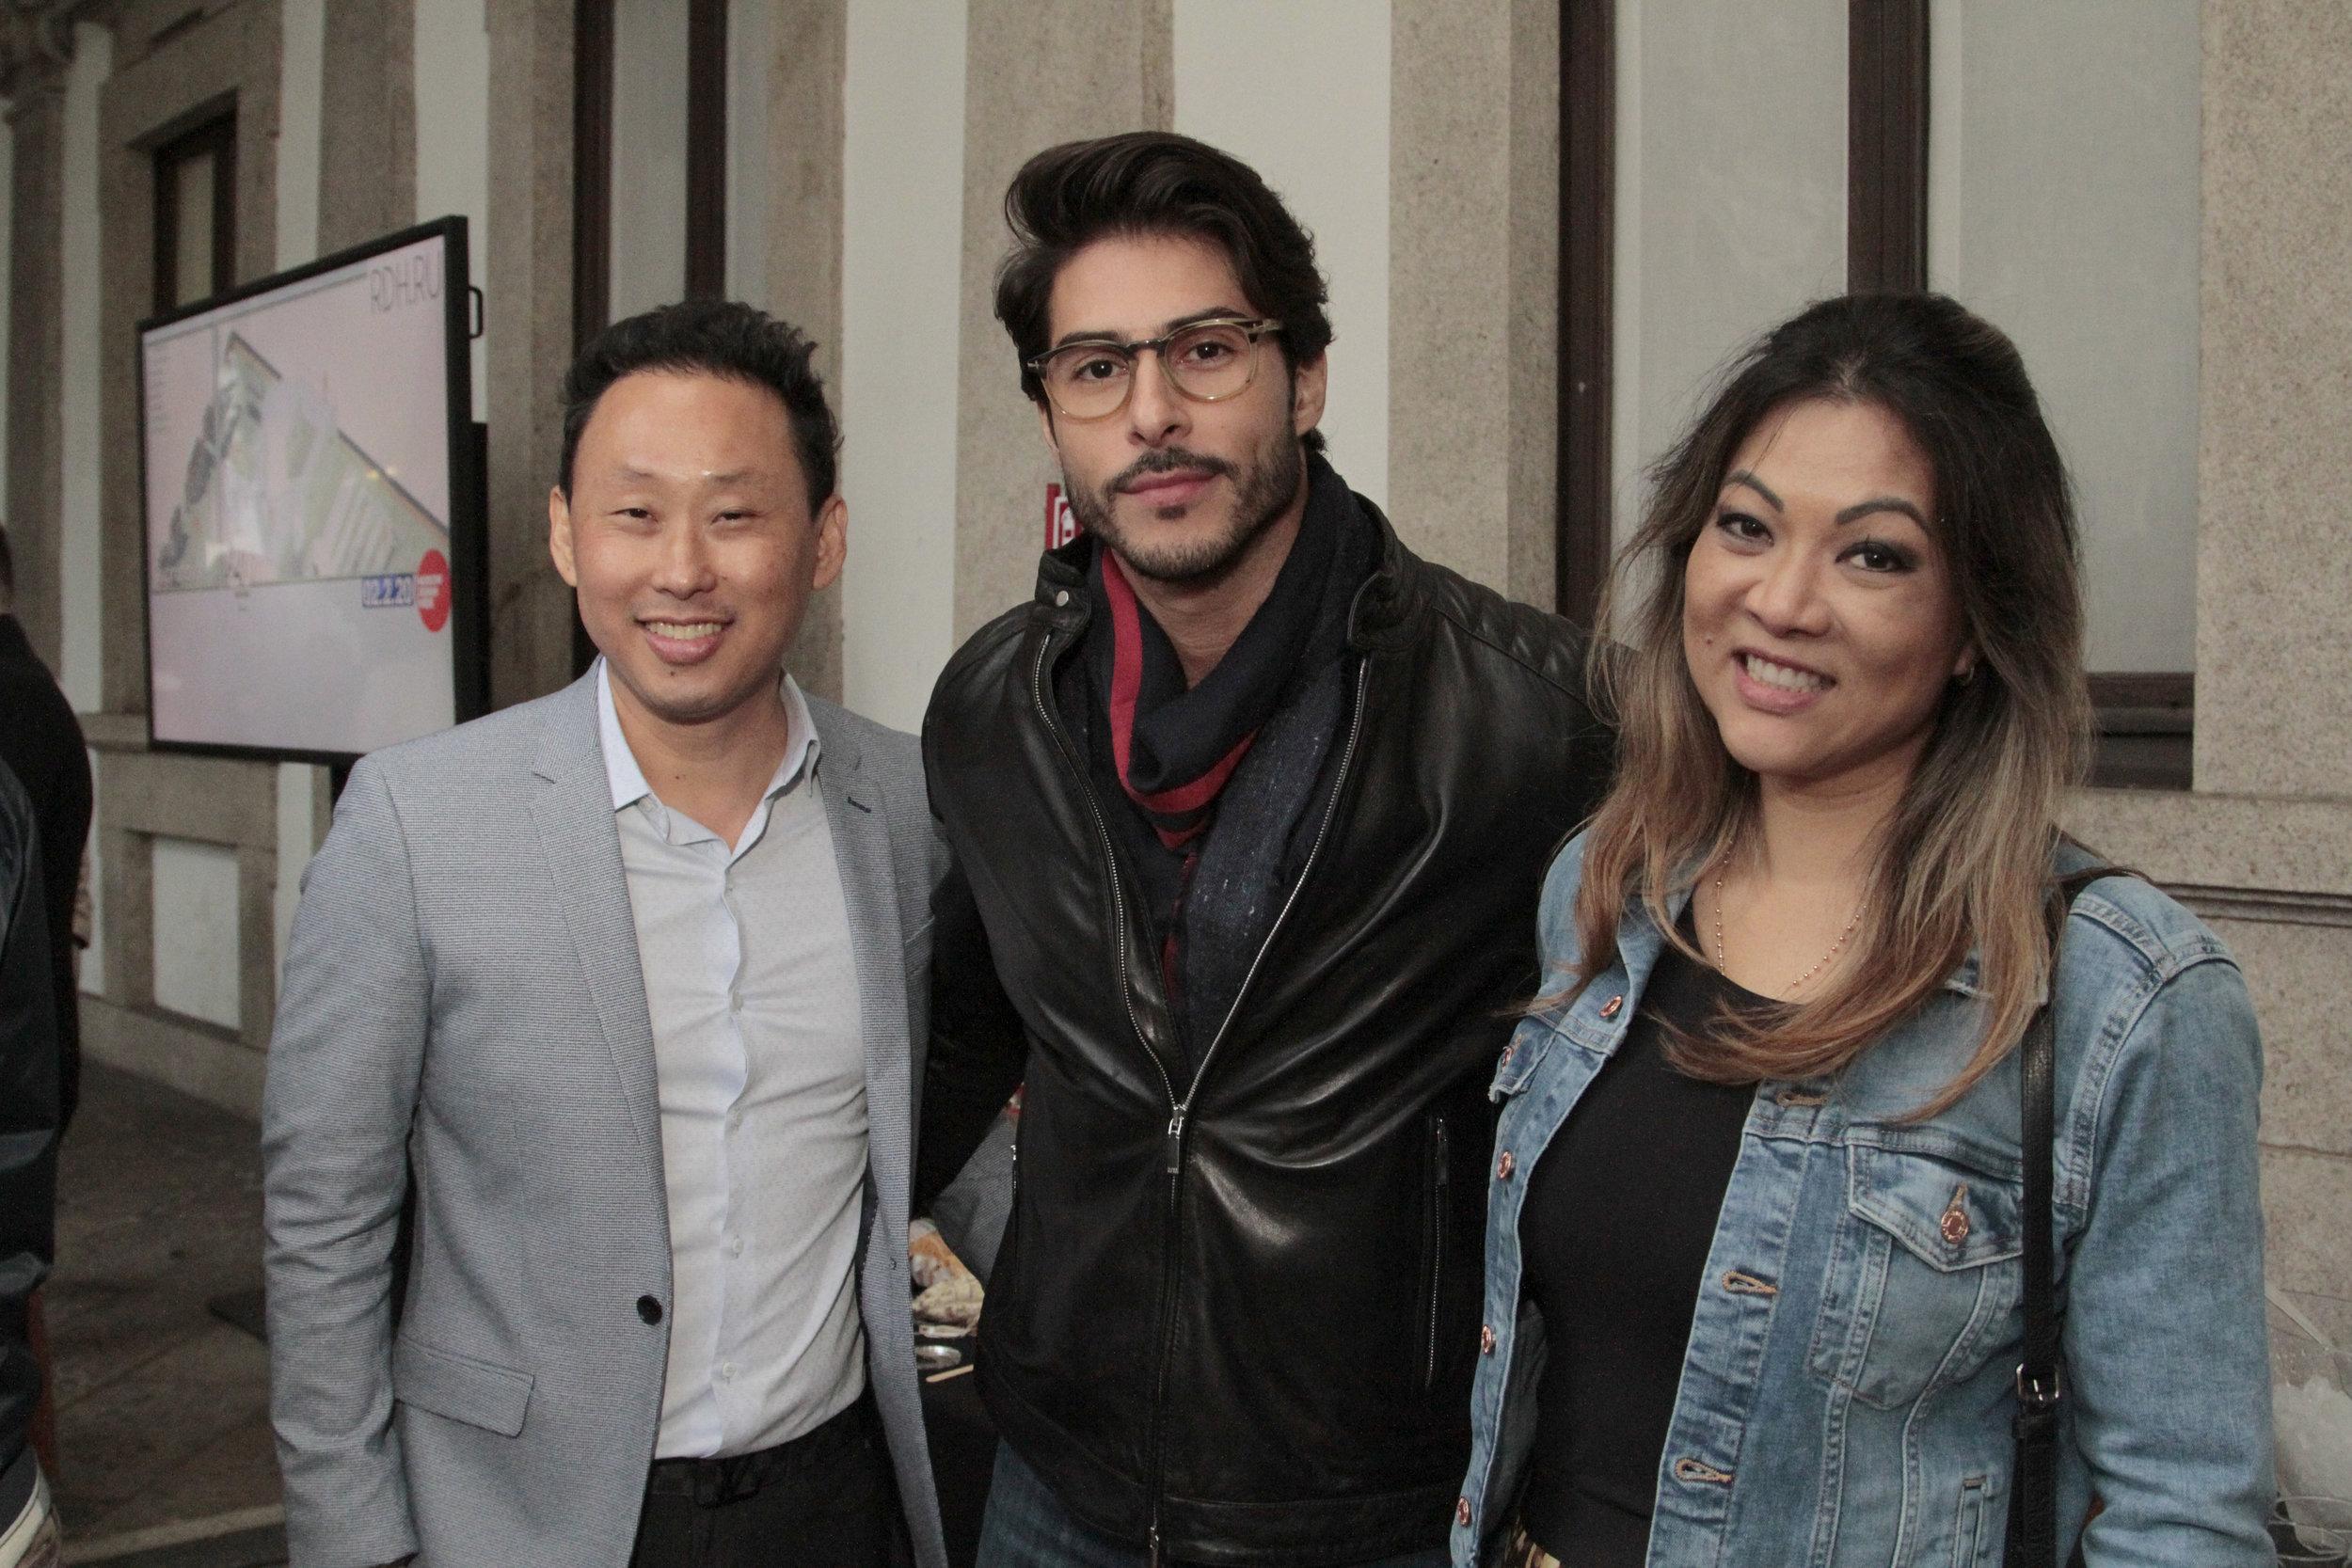 Fabiano Hayasaki, Bruno Santos e Tania Hayasaki